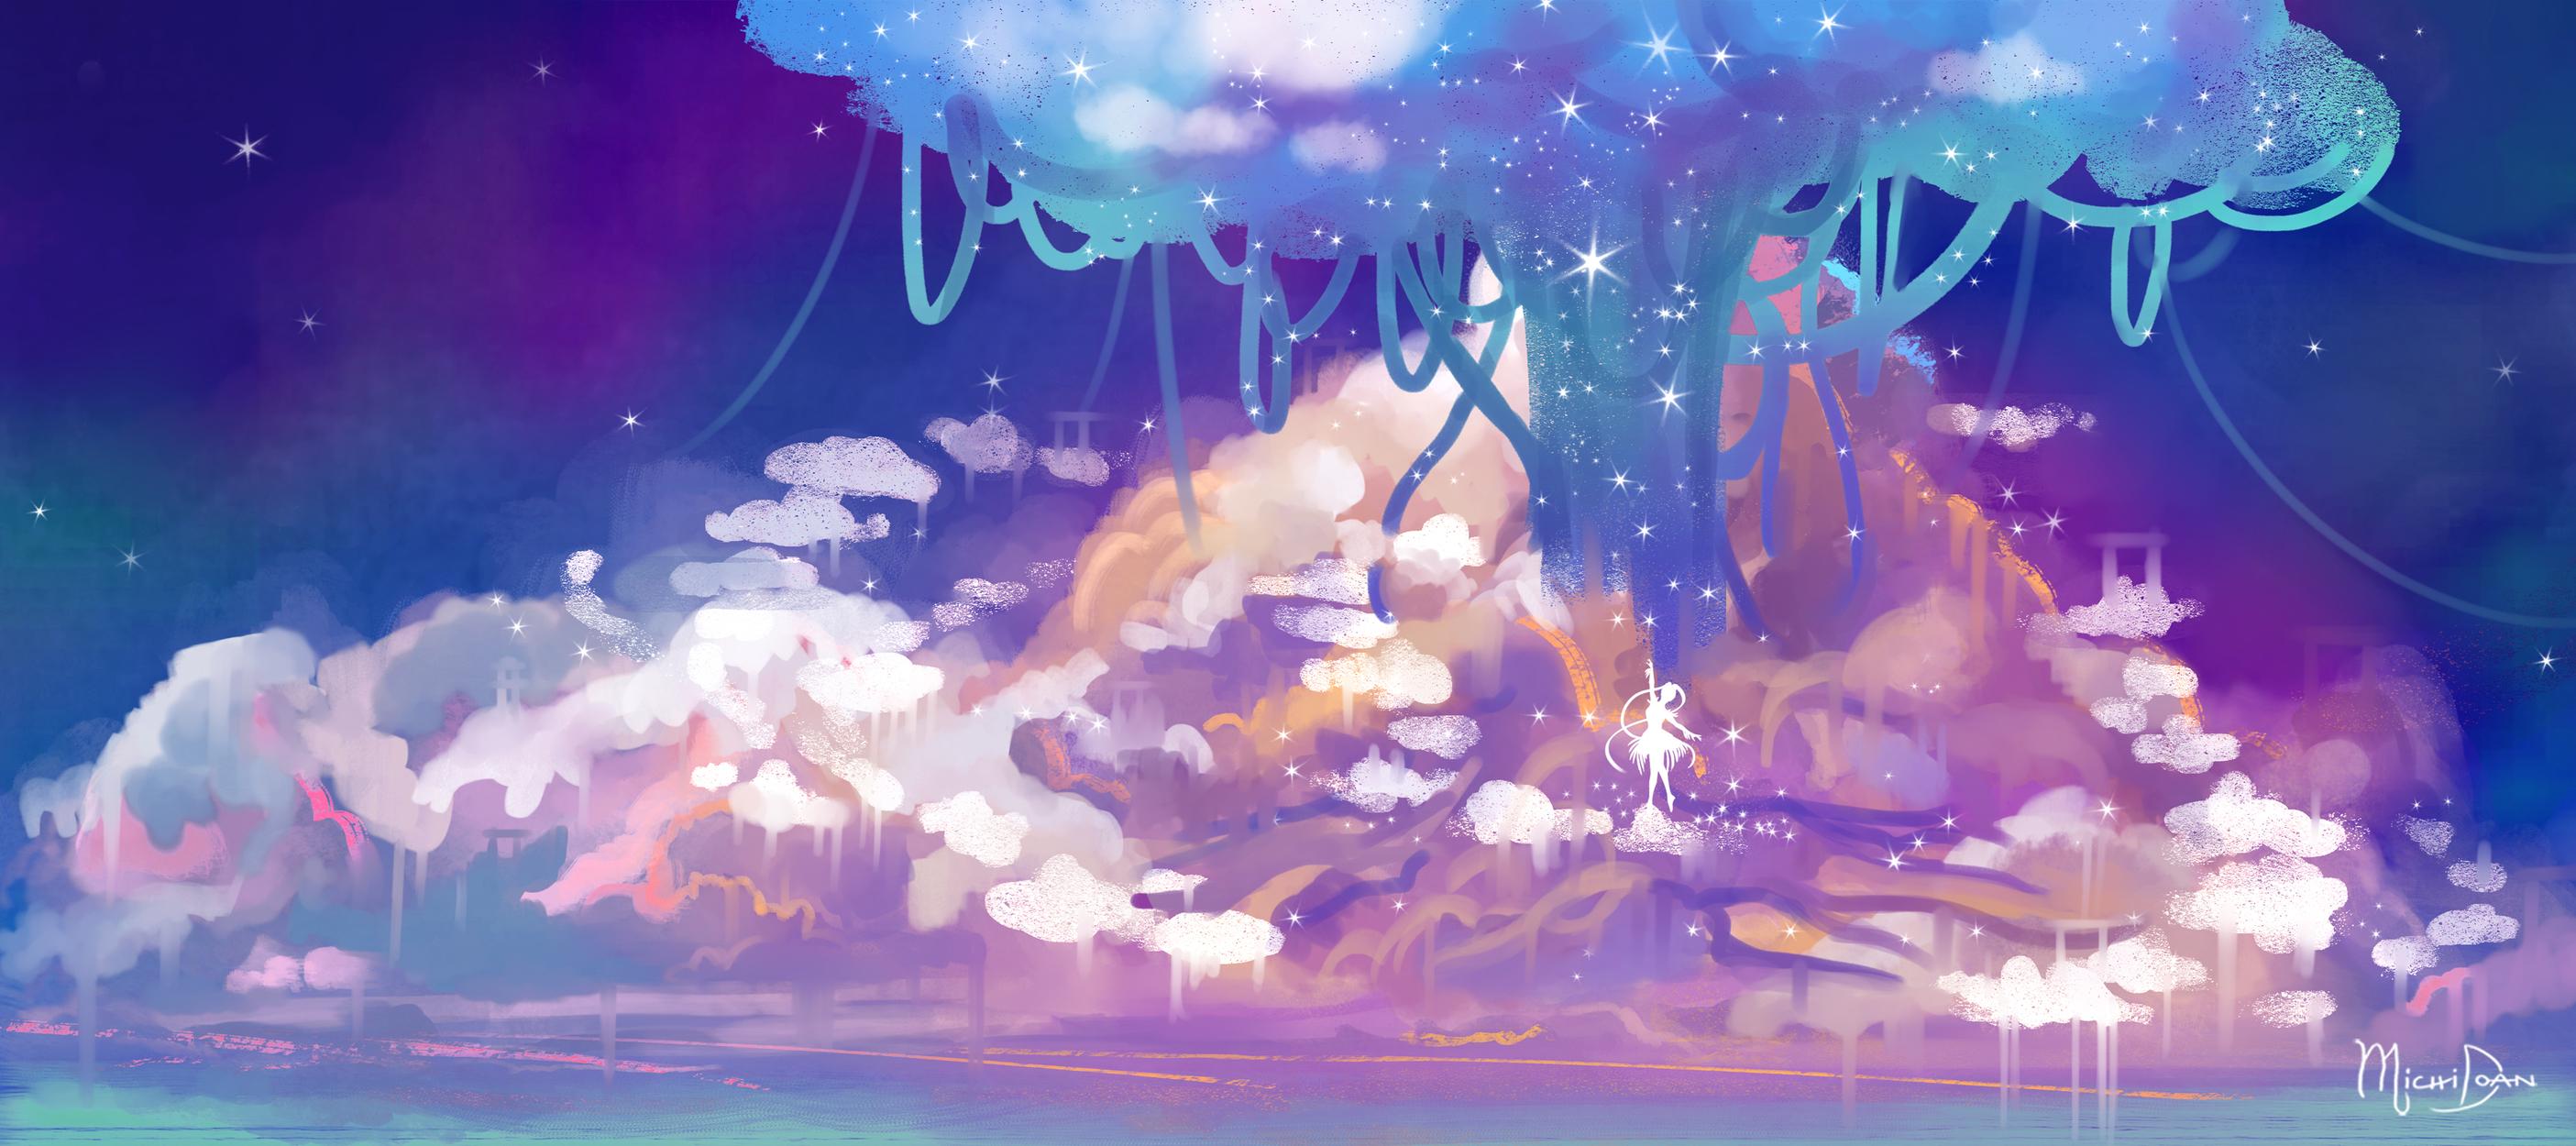 Startlight Dream Artwork by Michi Doan